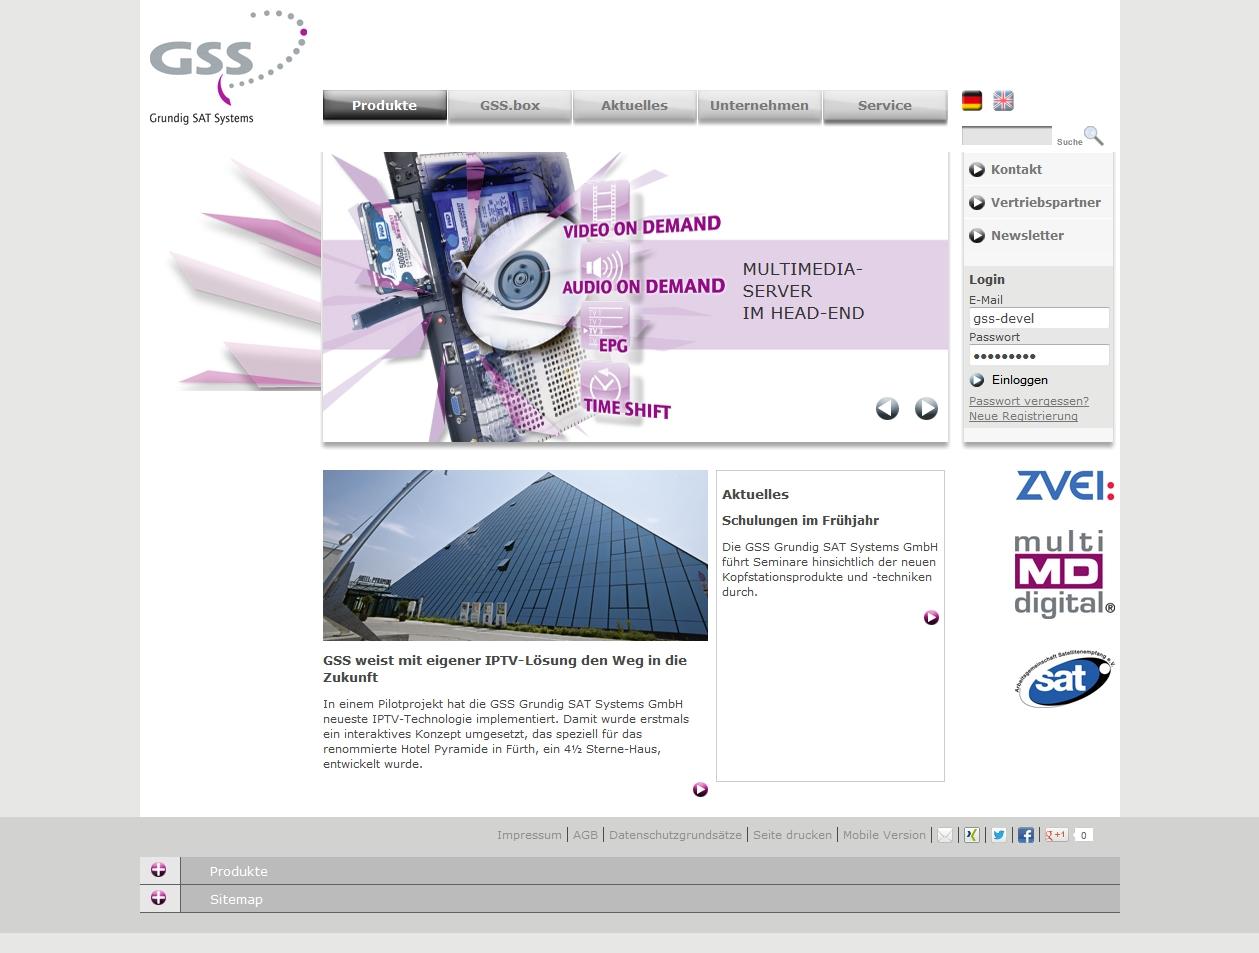 Grundig SAT Systems – gss.de